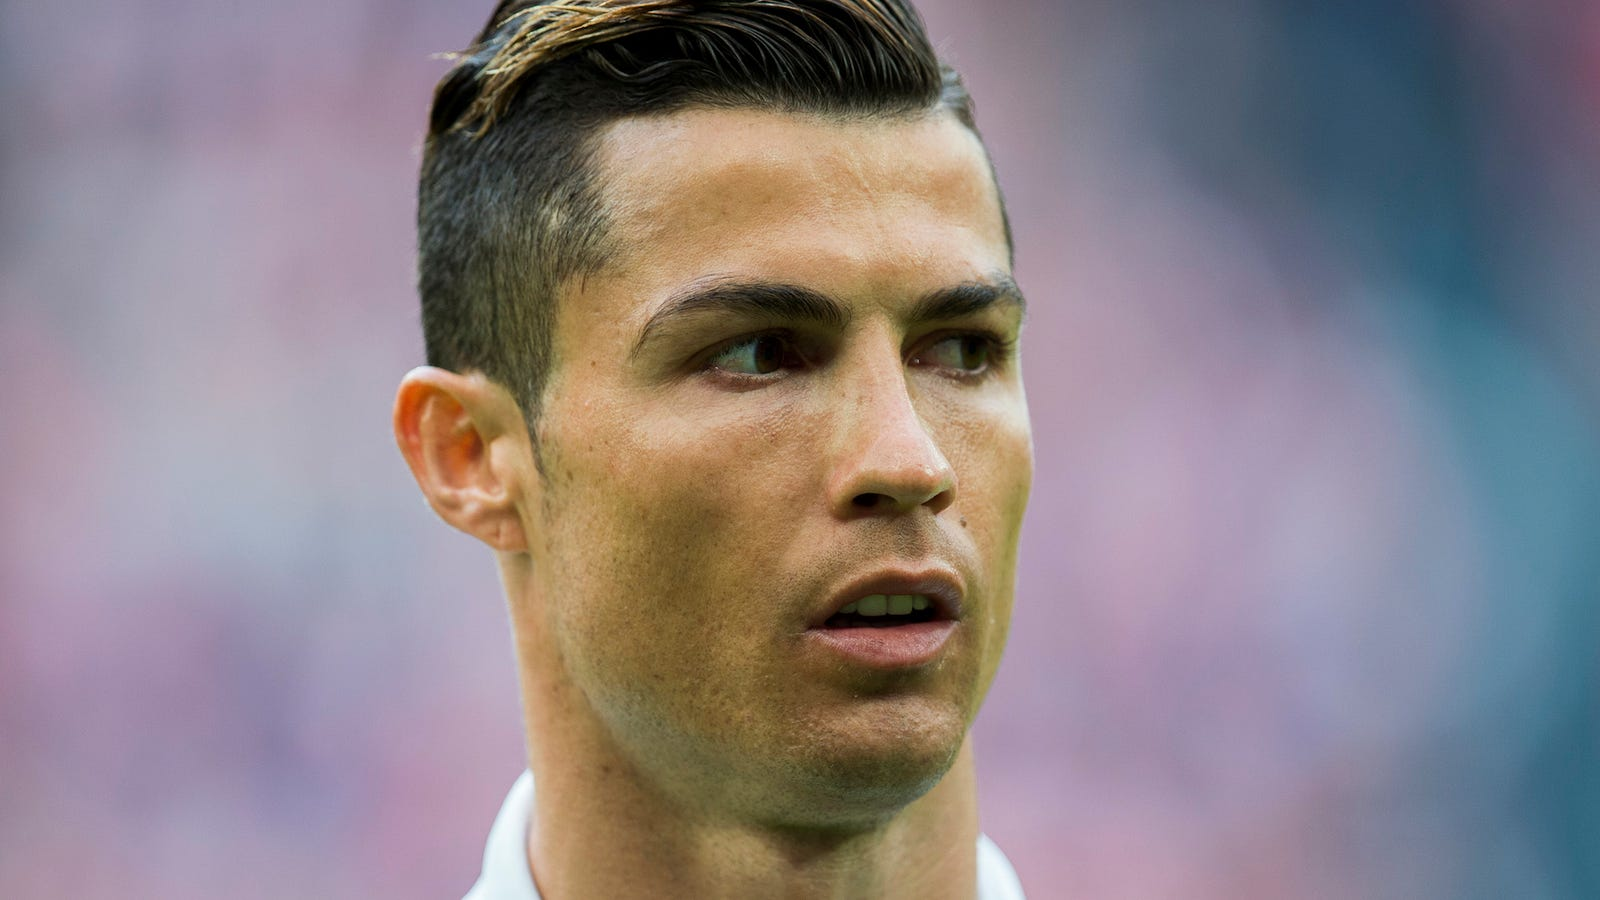 Report Cristiano Ronaldo Paid 375k To Woman Who Claimed He Raped Her